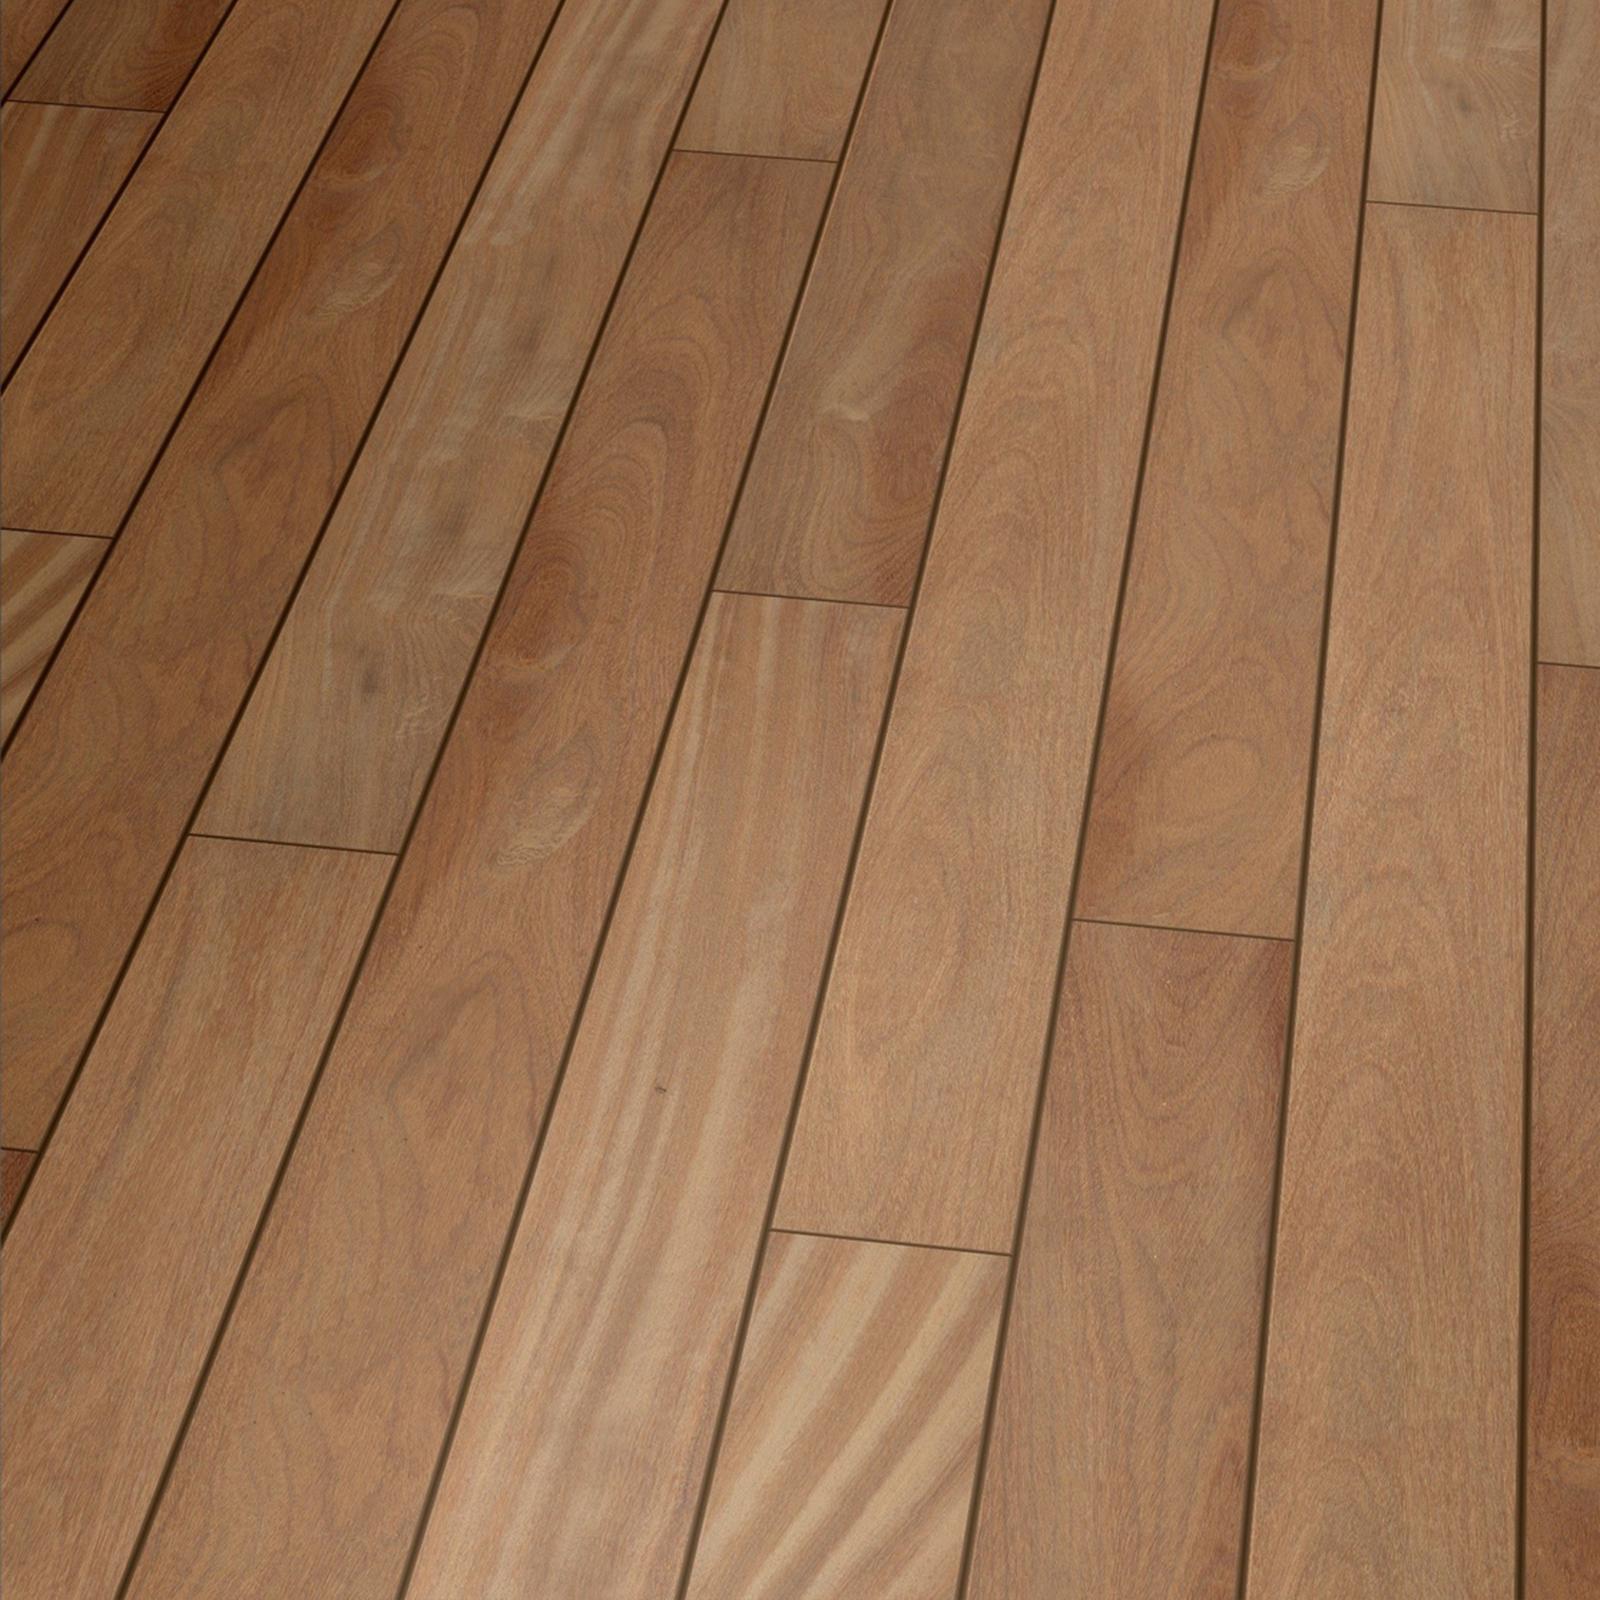 Terrassendiele-Holz-Cumaru-massiv-gehobelt-Komplettset-Komplettbausatz-5-78-m